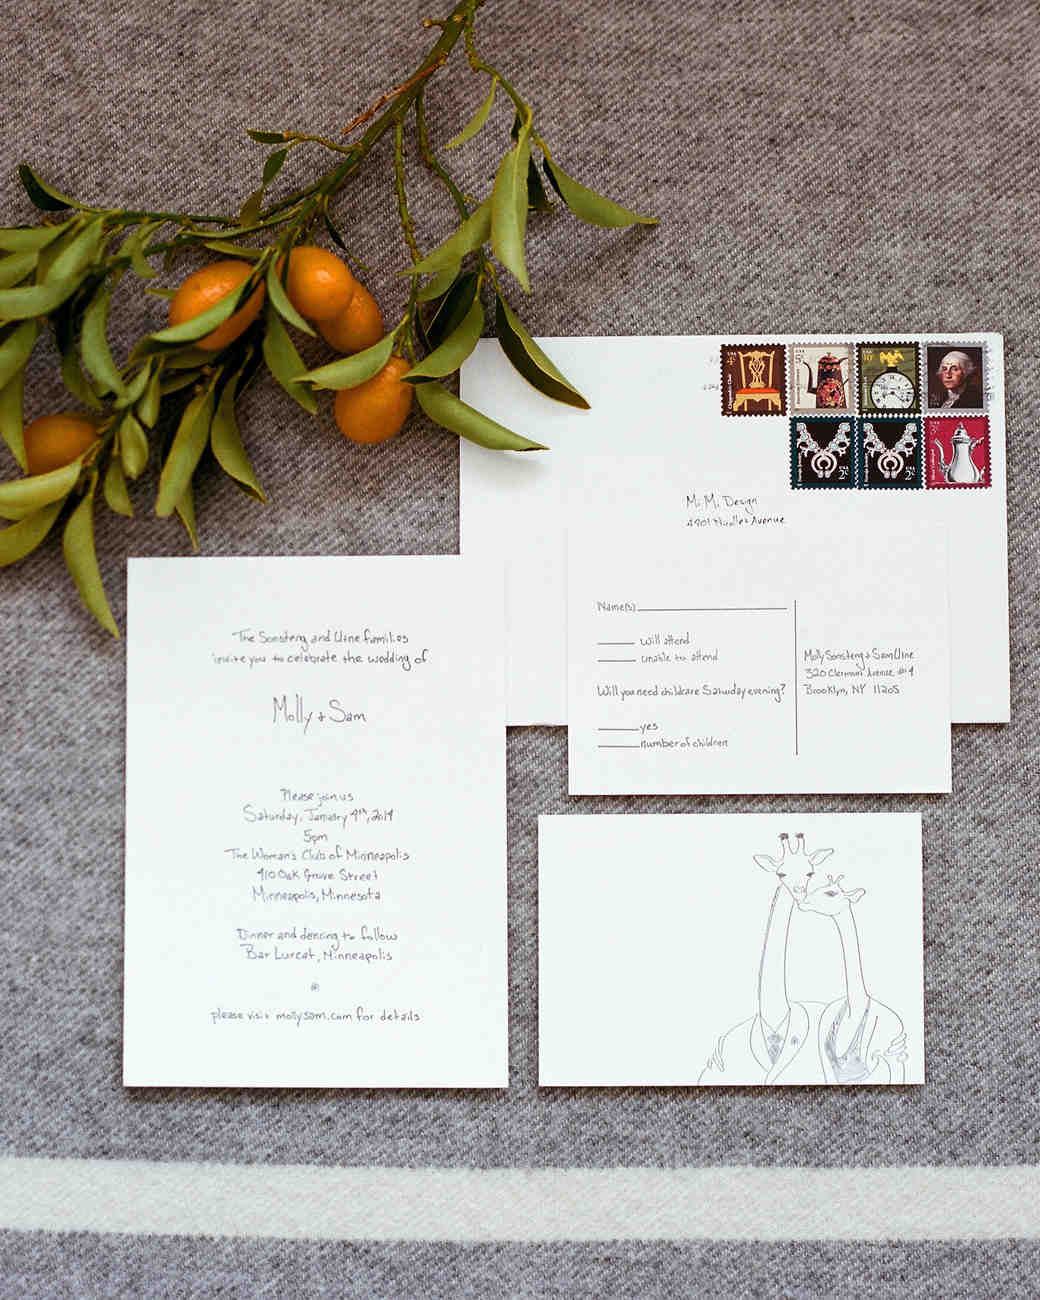 molly-sam-wedding-invite2-0614.jpg